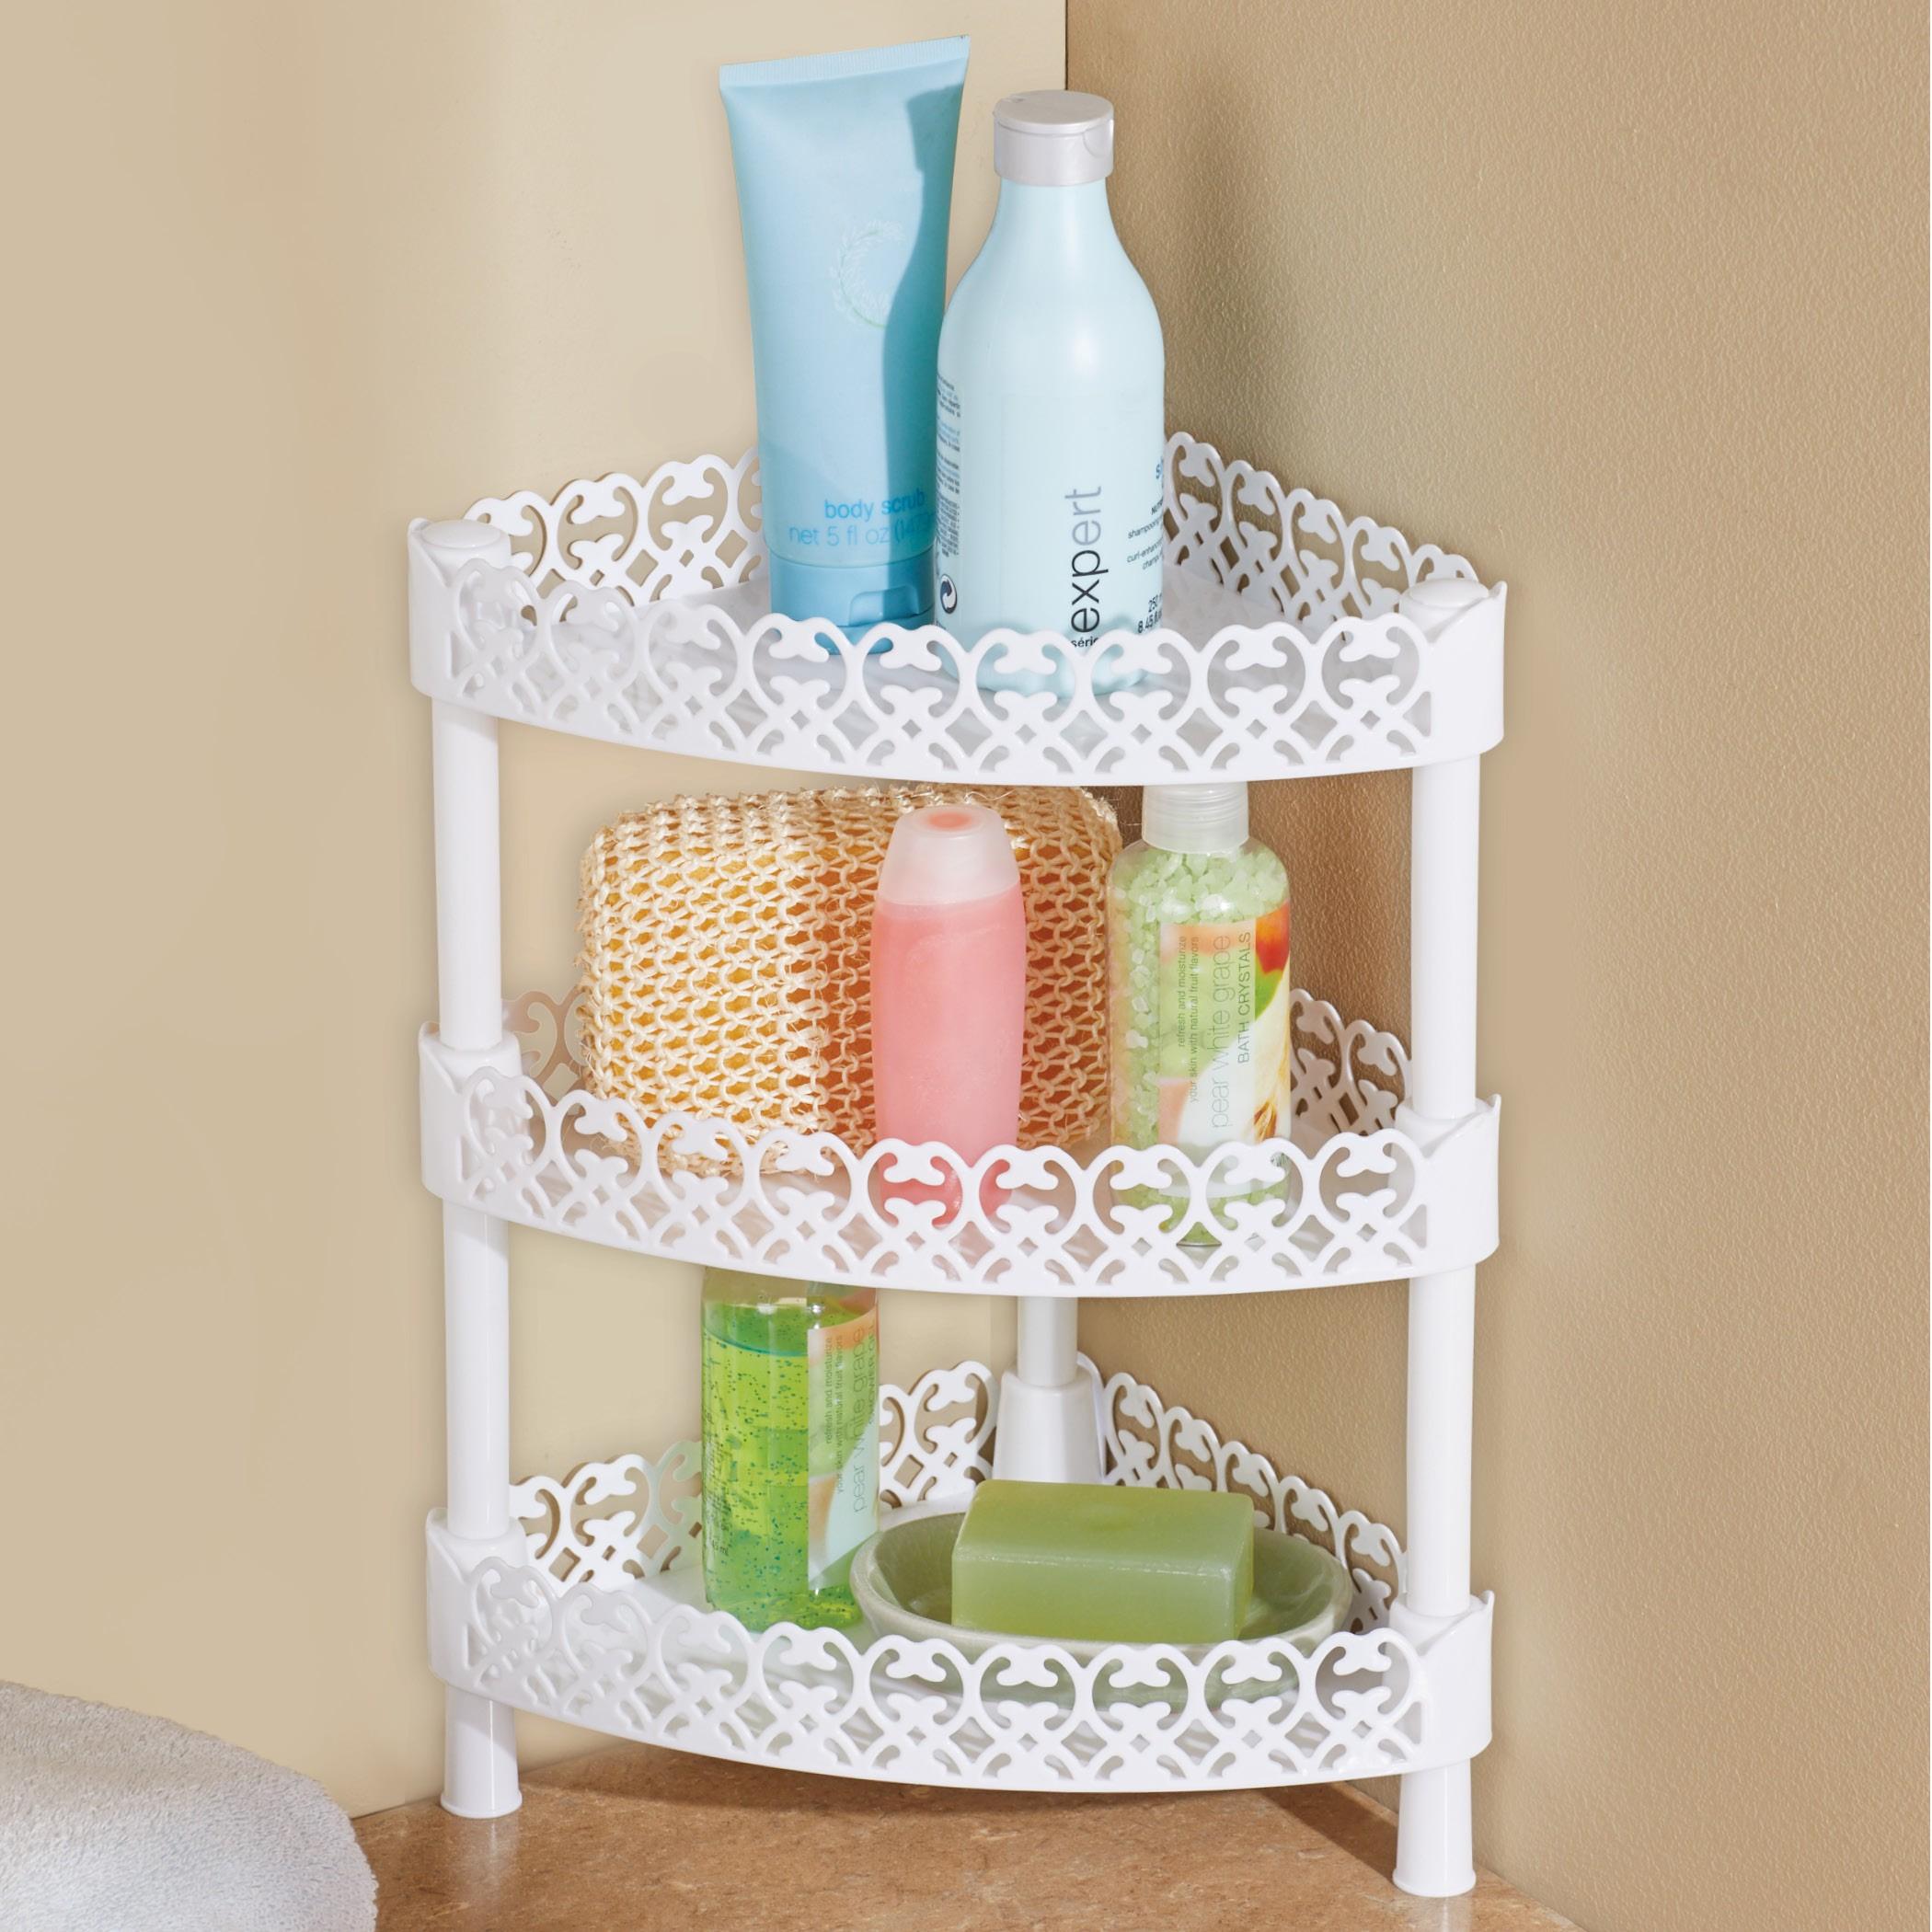 tiered bathroom countertop organizer  White Scrolling 3-Tiered Corner Organizer Shelf for ..